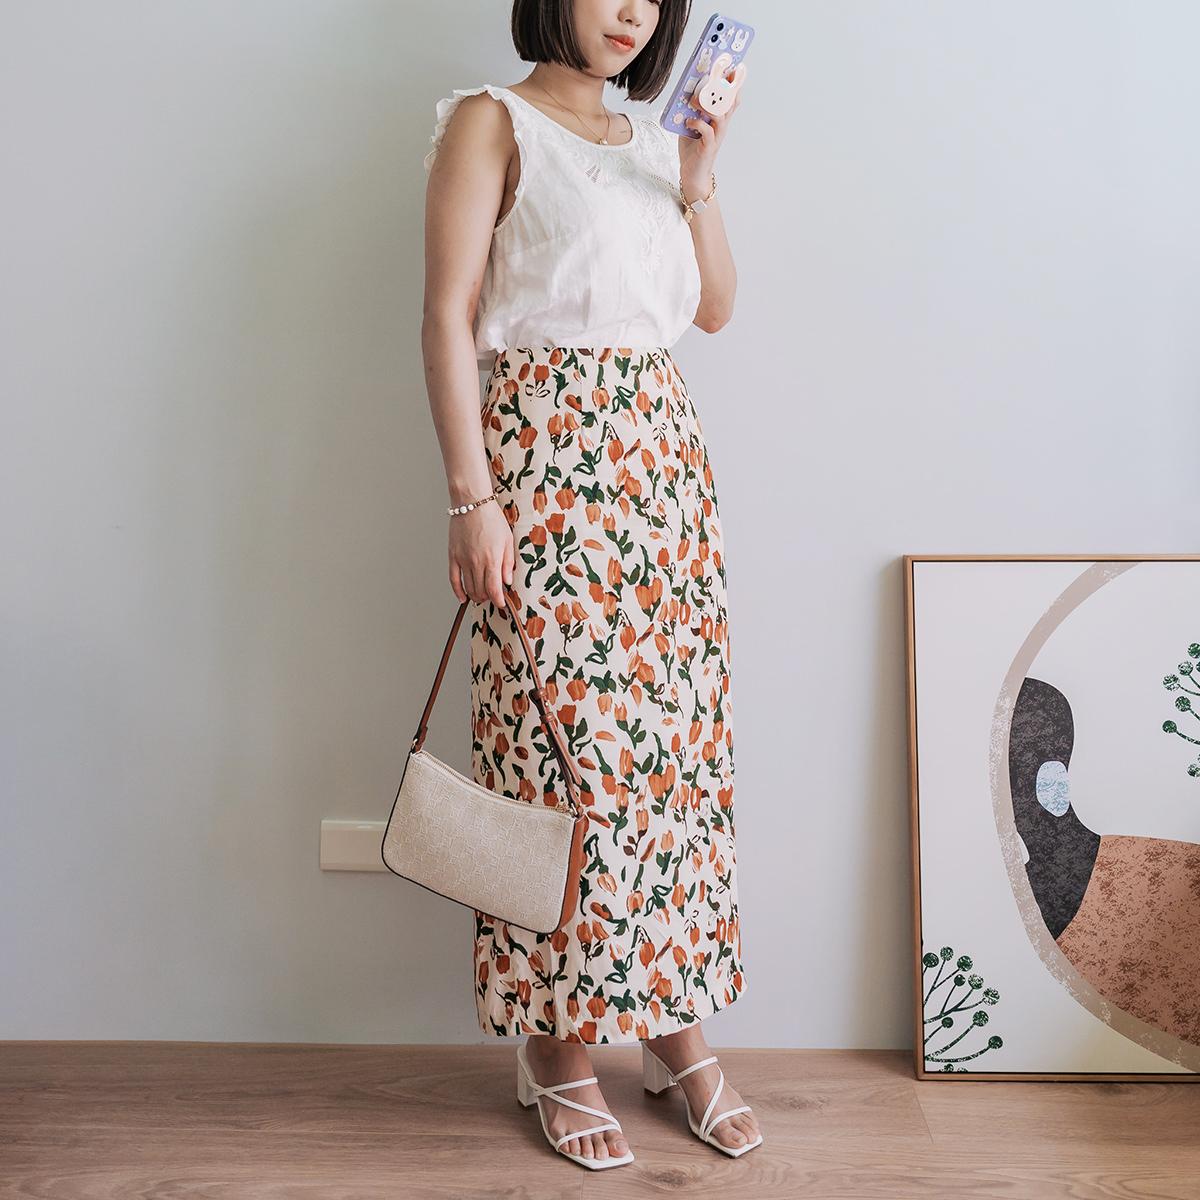 Loobook ∎ 立秋後的濃郁橘色調・Dobe Korea 鬱金香棉麻開衩窄裙